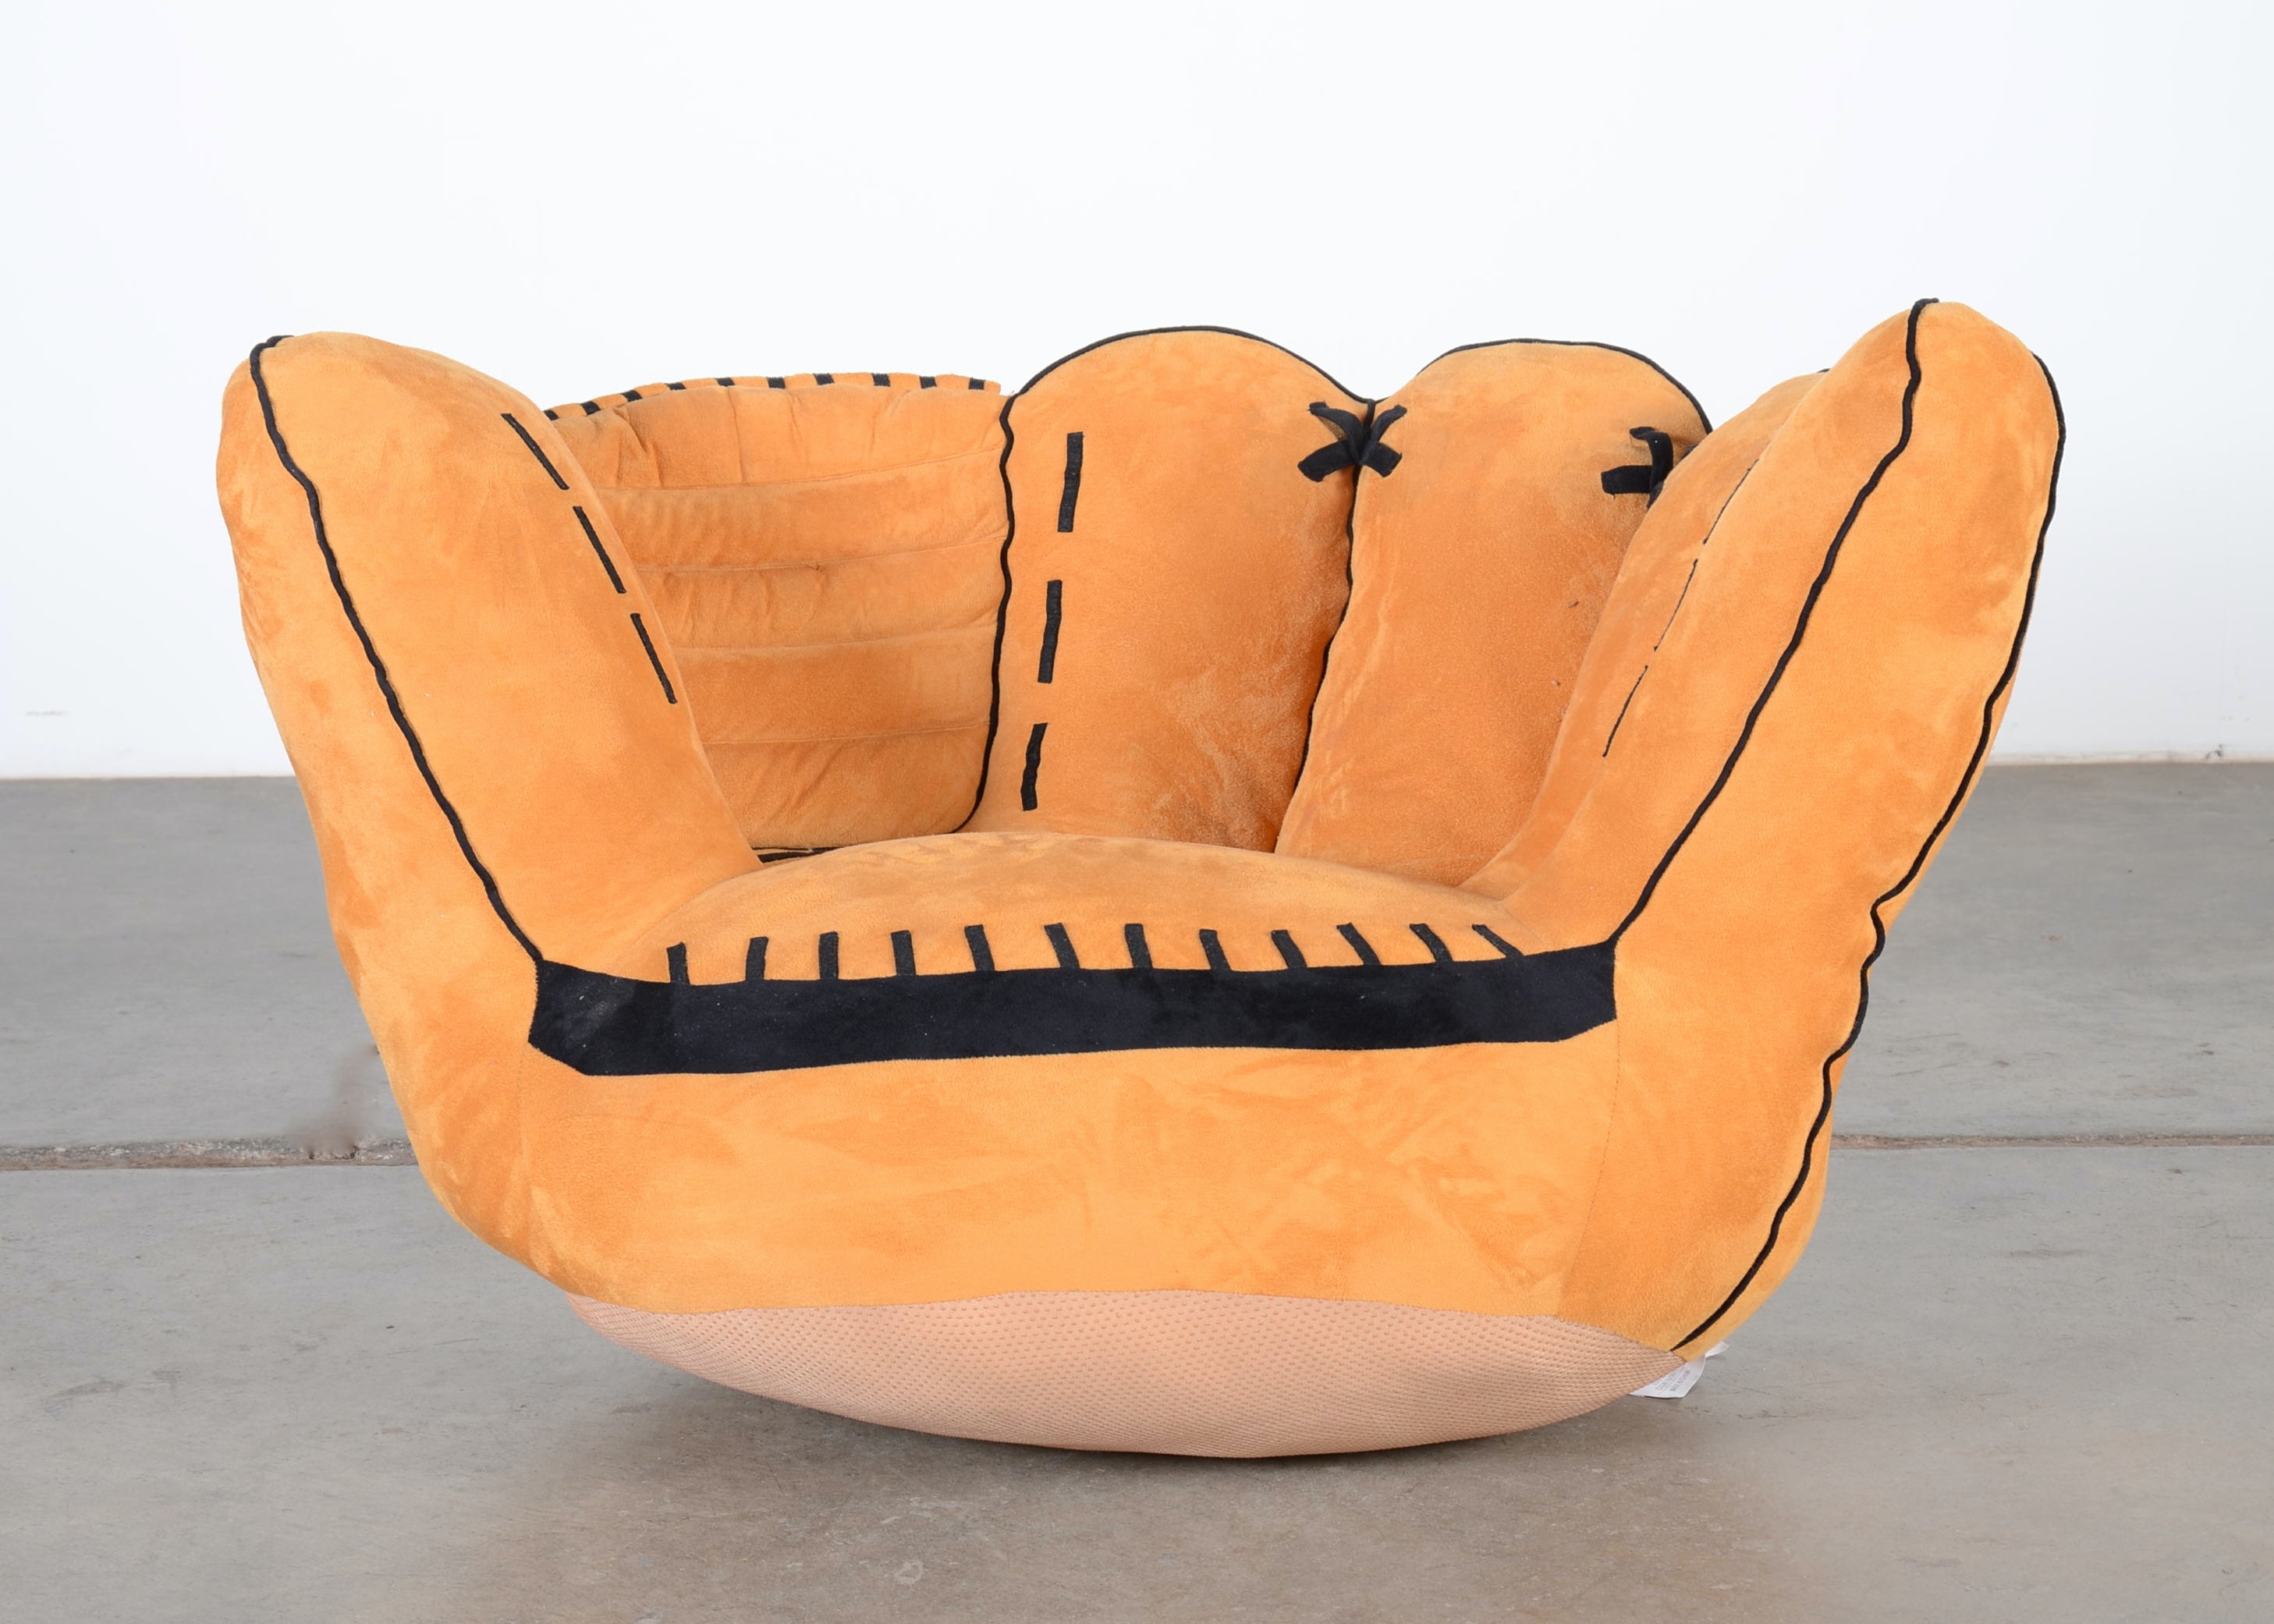 Childu0027s Stuffed Catcheru0027s Mitt Chair ...